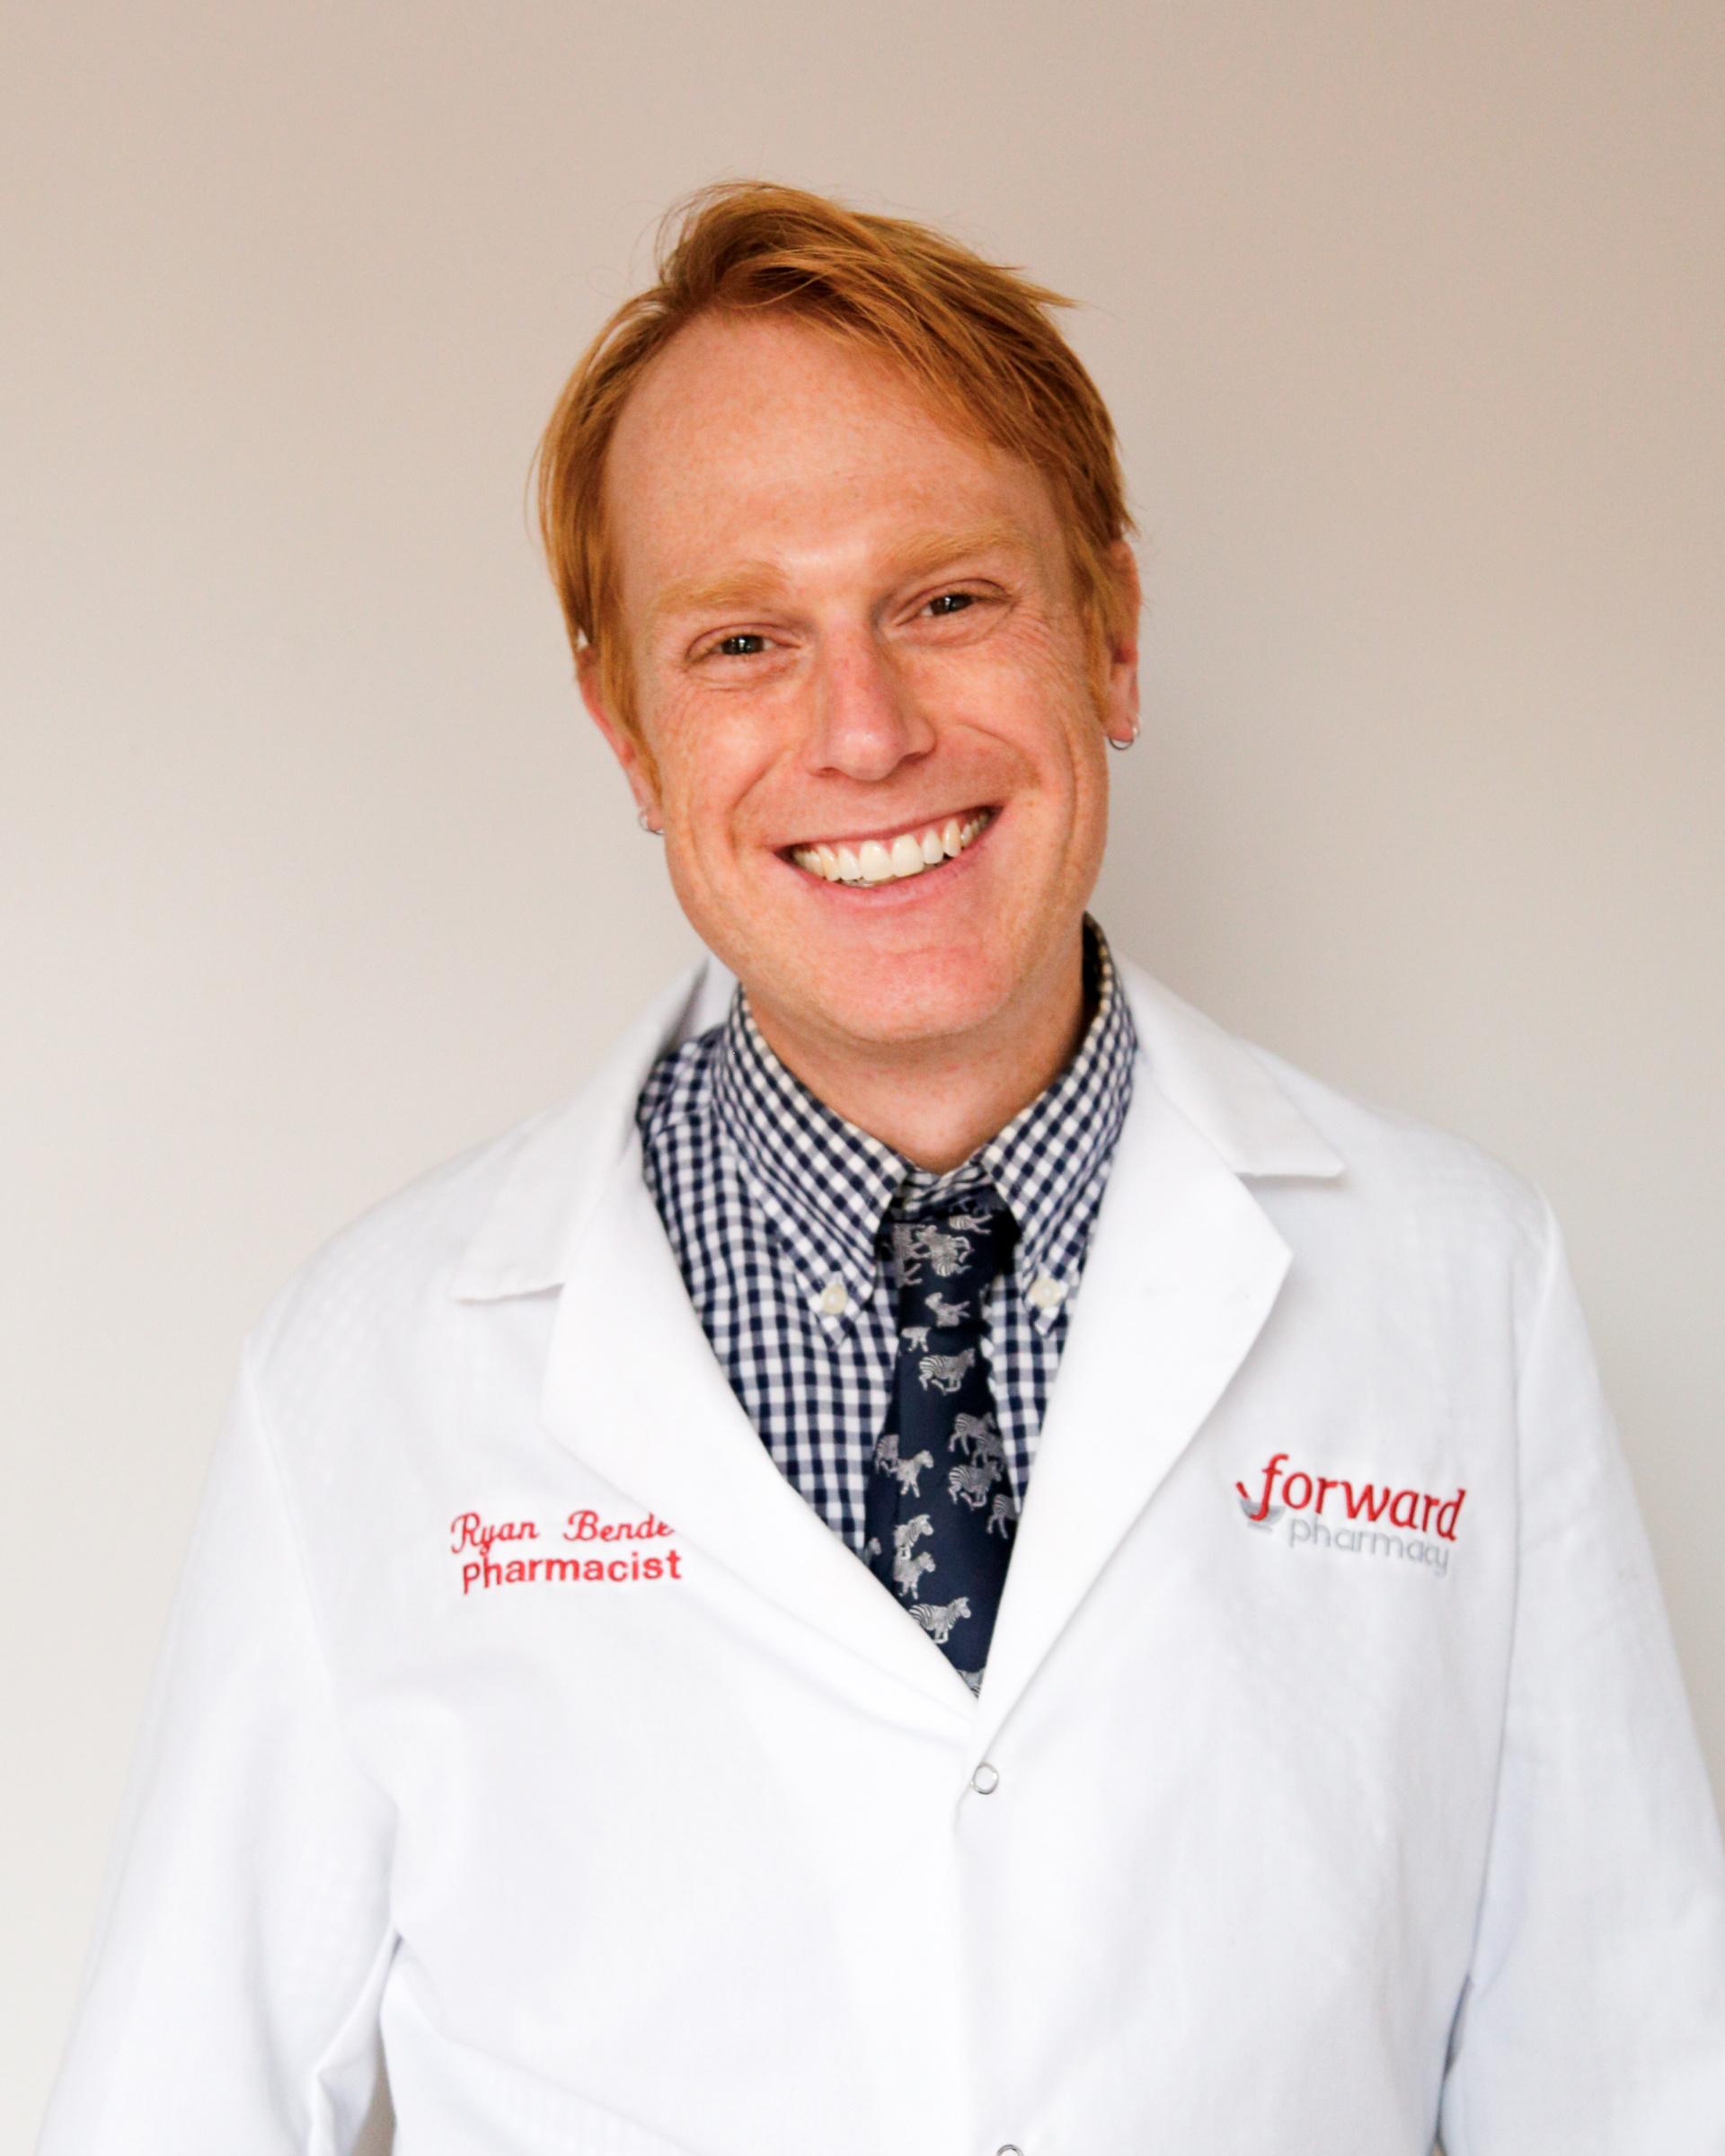 Ryan Bender, Pharmacist